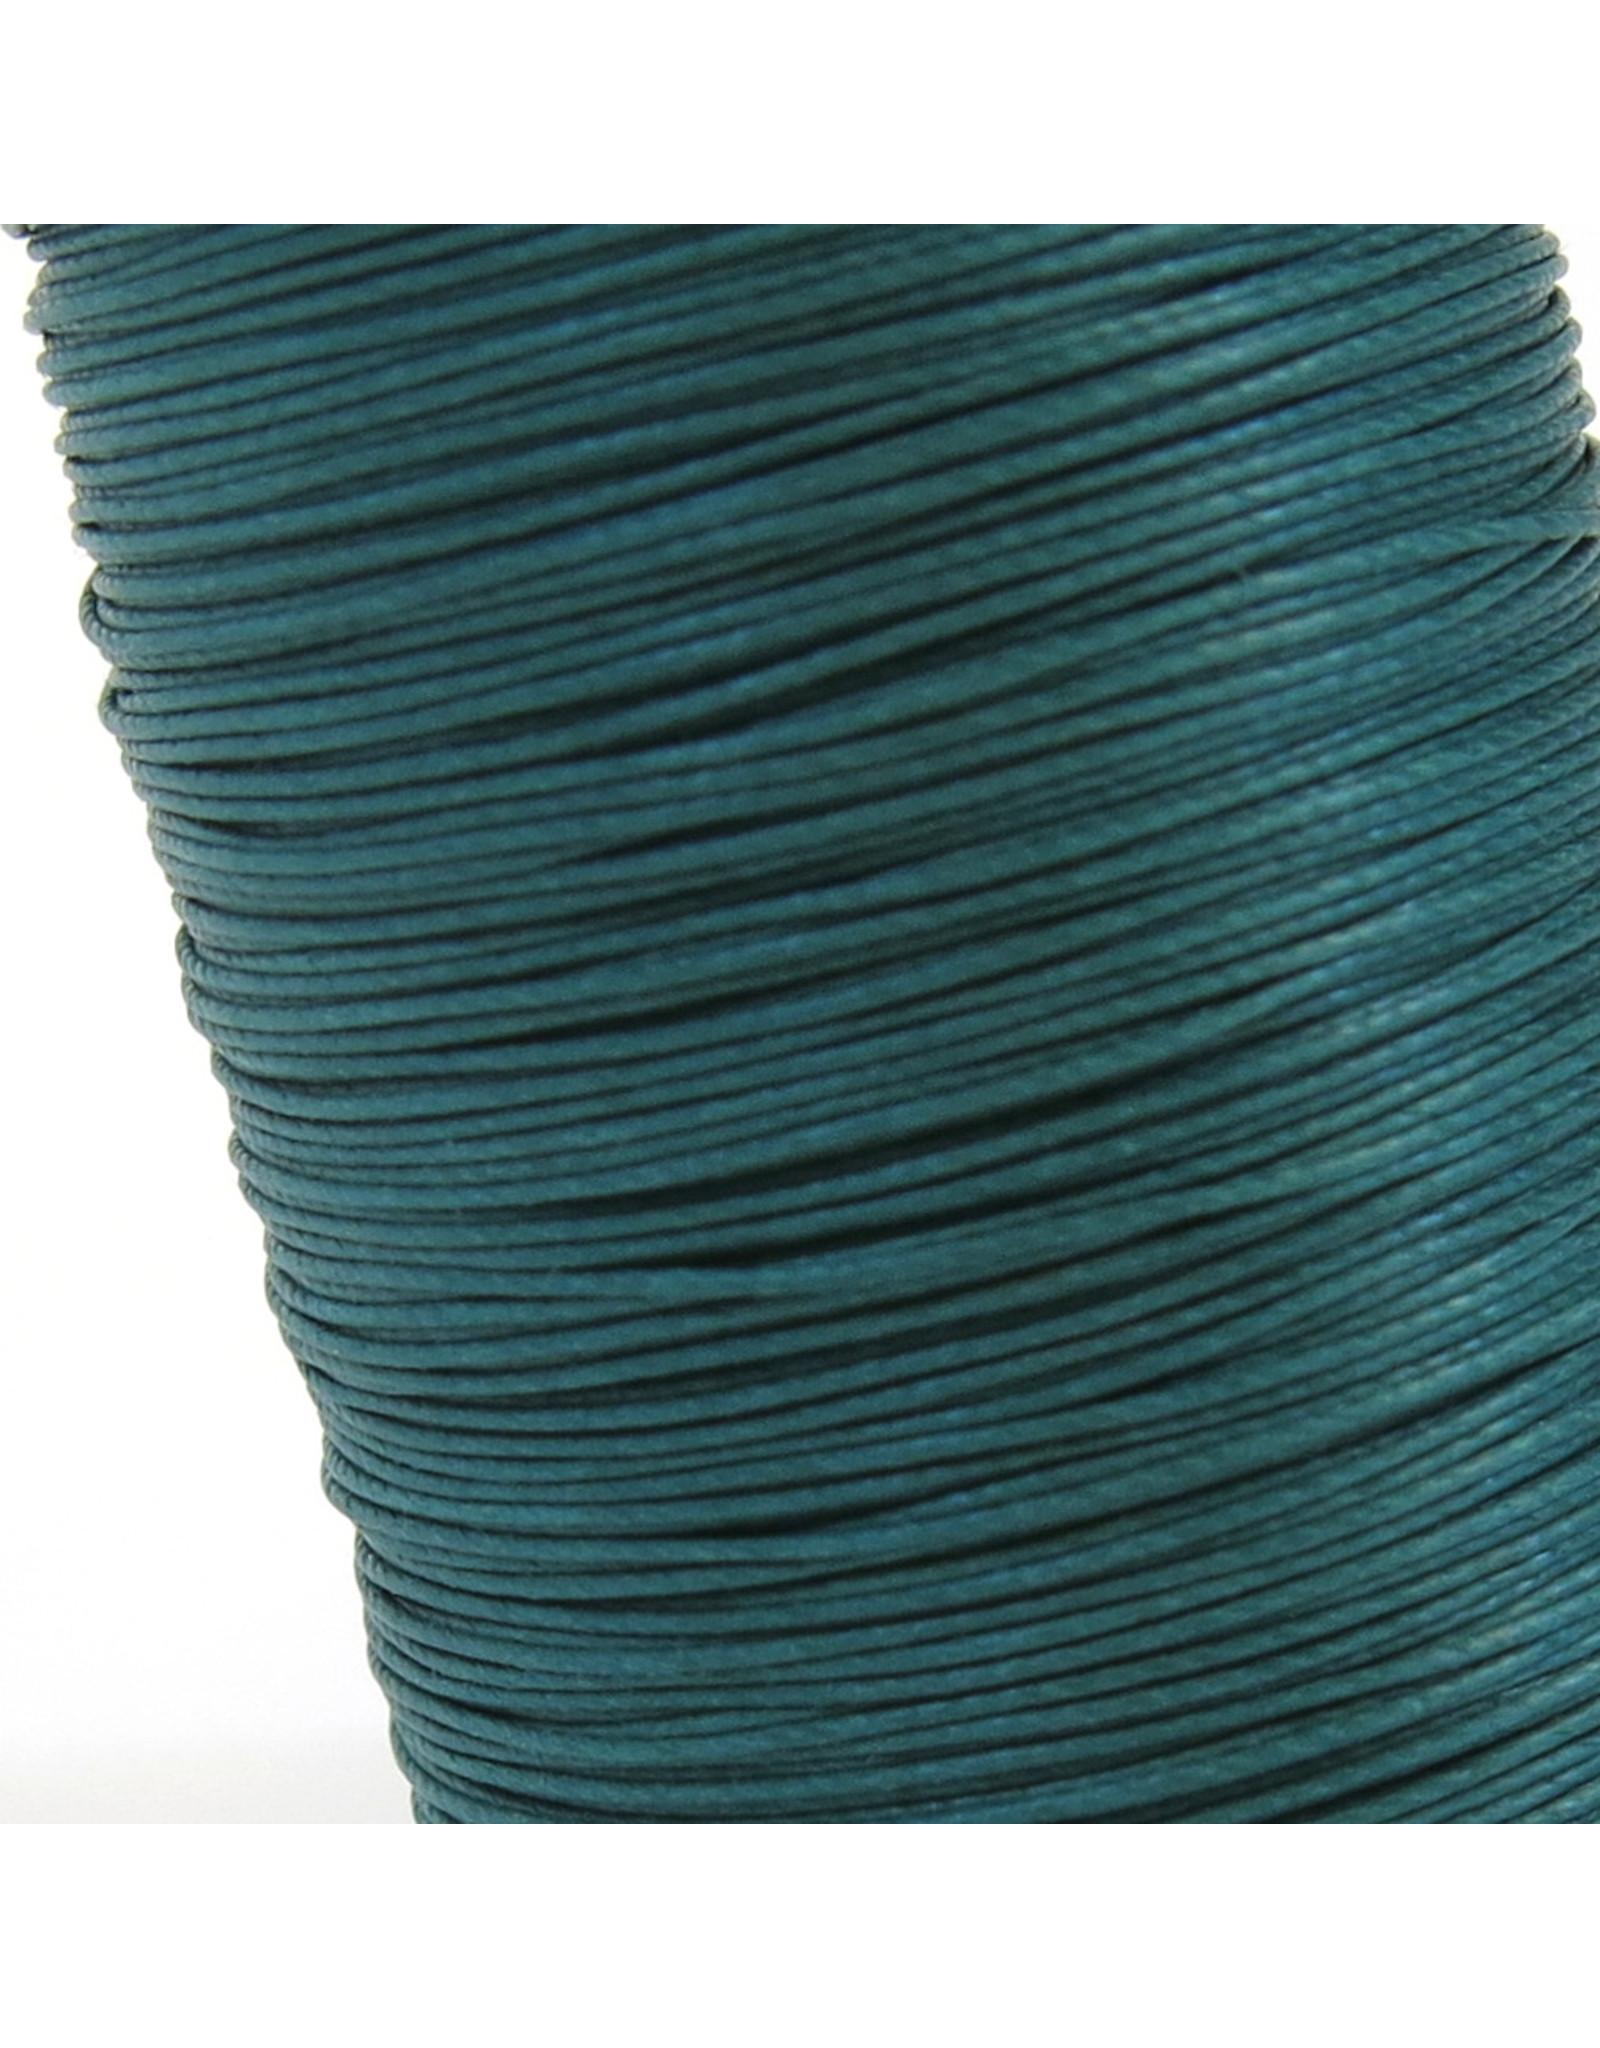 Hand sewing thread Emerald/Teal